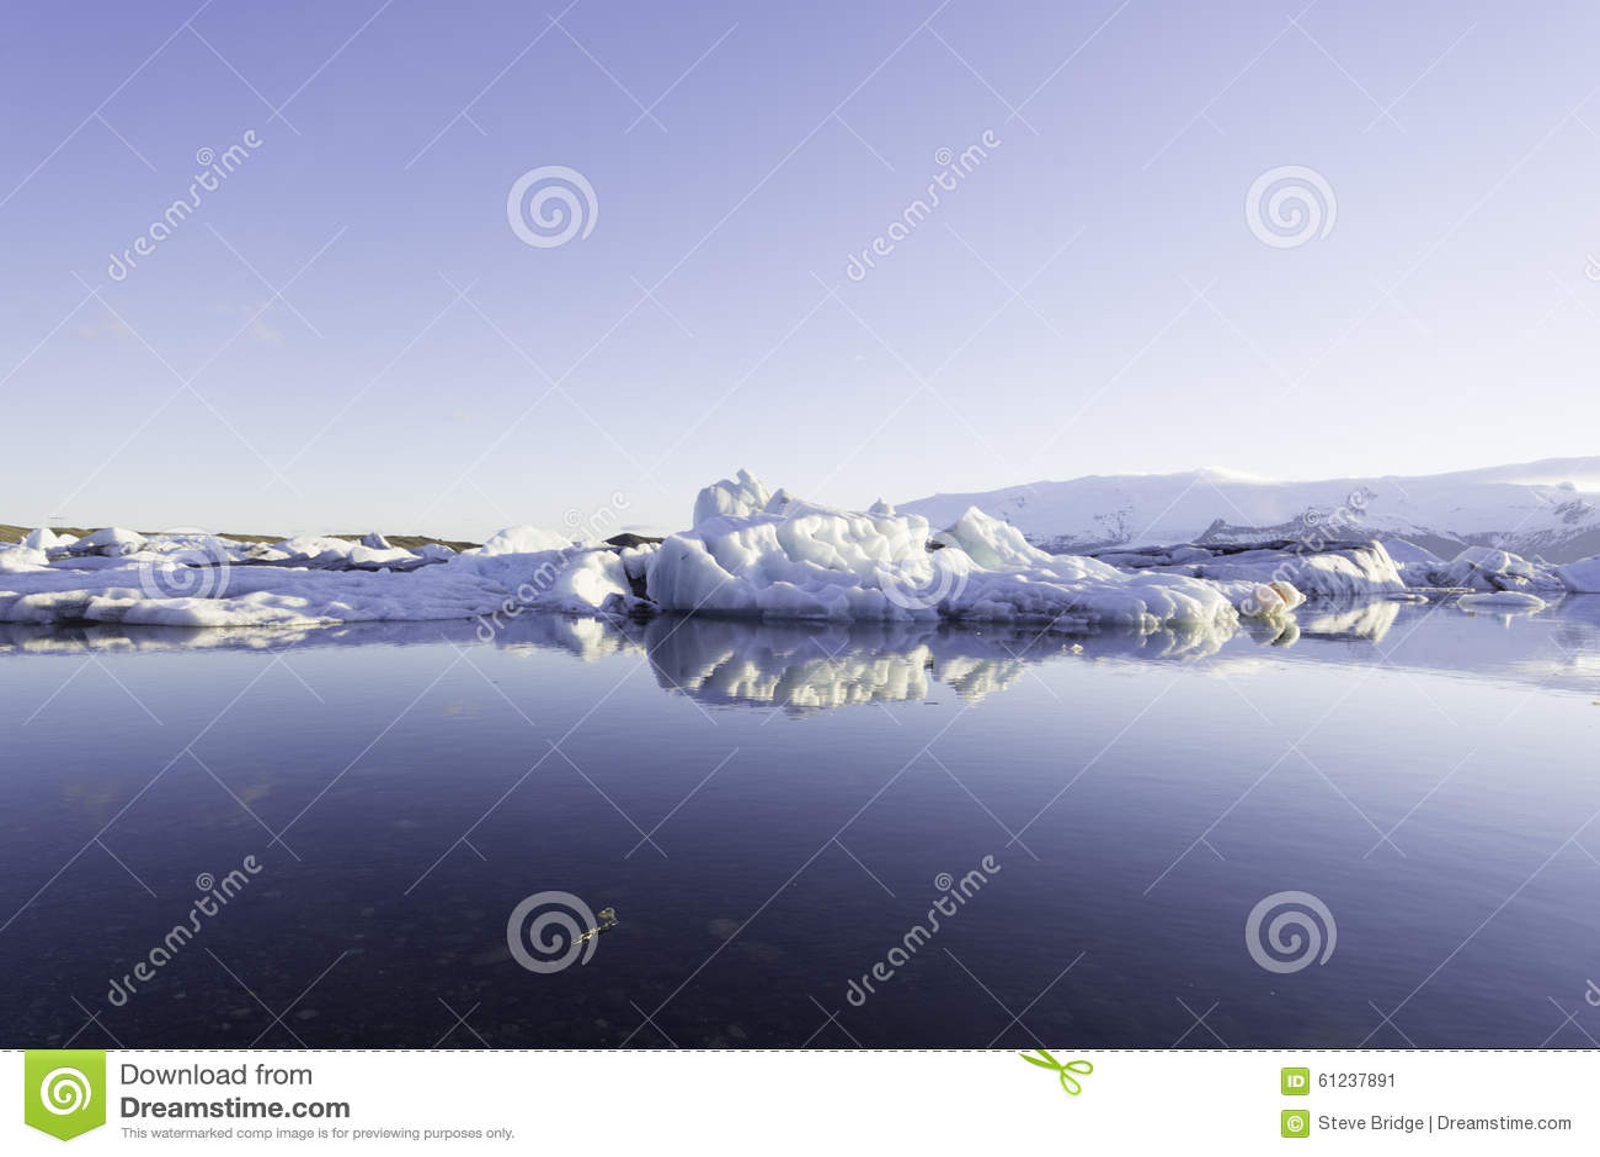 冰山在Jokulsarlon冰川湖